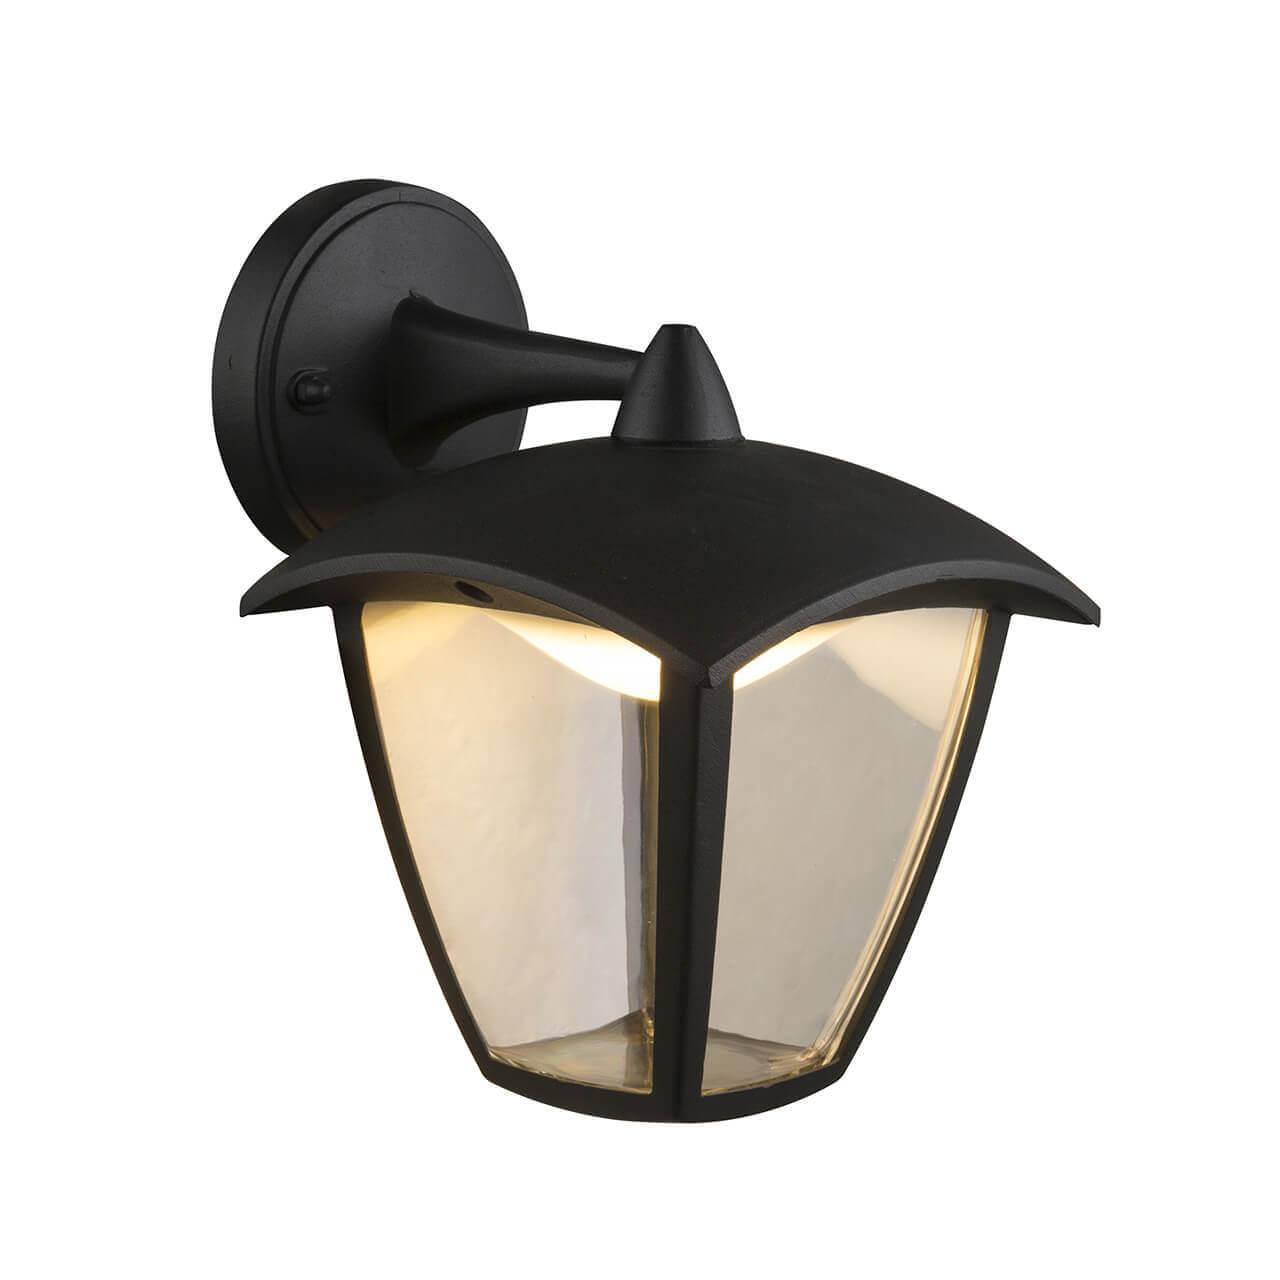 Уличный настенный светодиодный светильник Globo Delio 31826 globo фонарный столб globo delio 31828